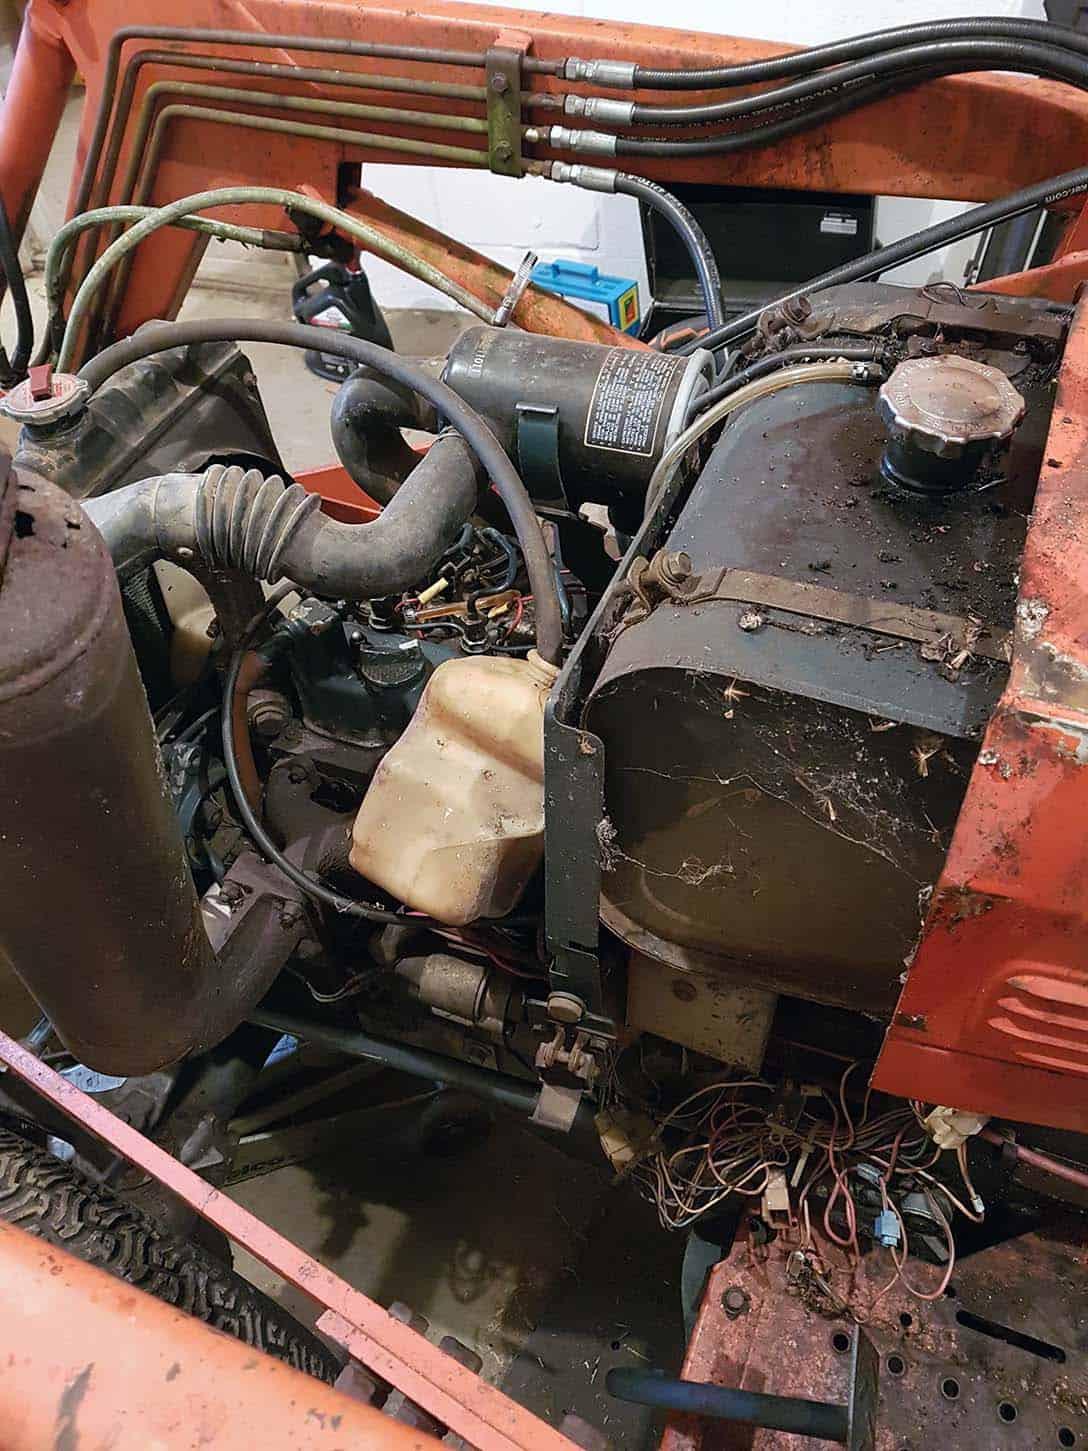 Kubota B20 weathered engine compartment.